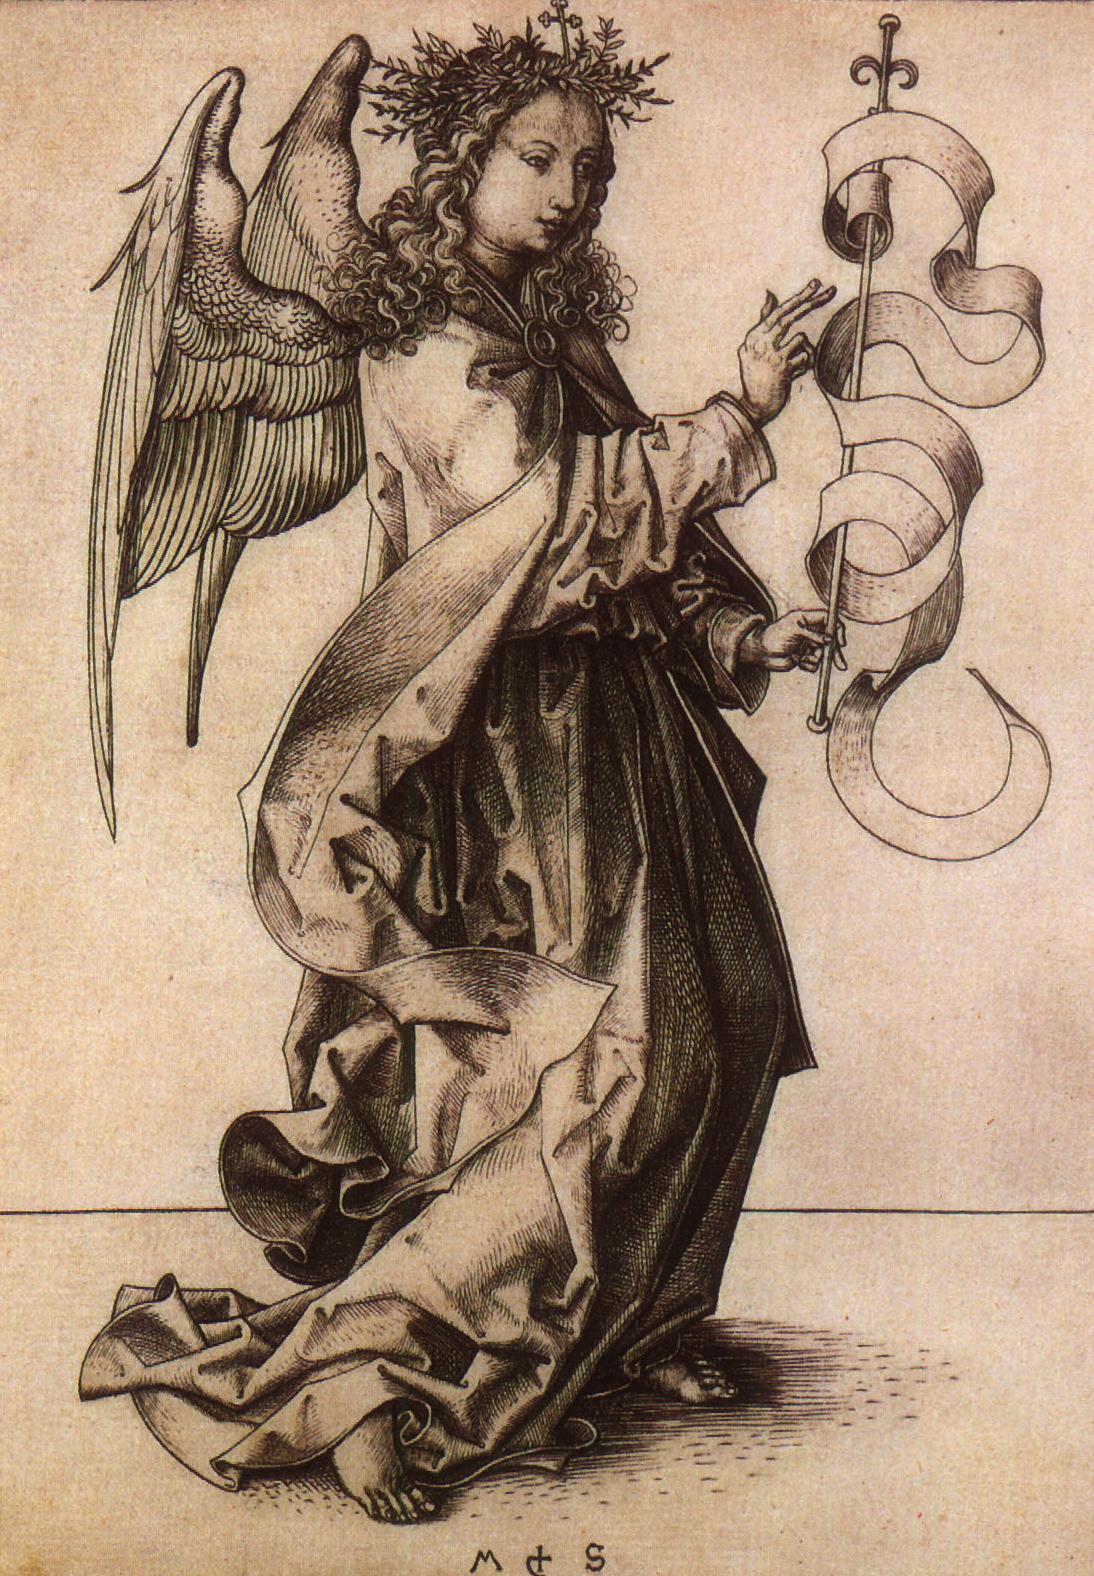 Martin Schongauer